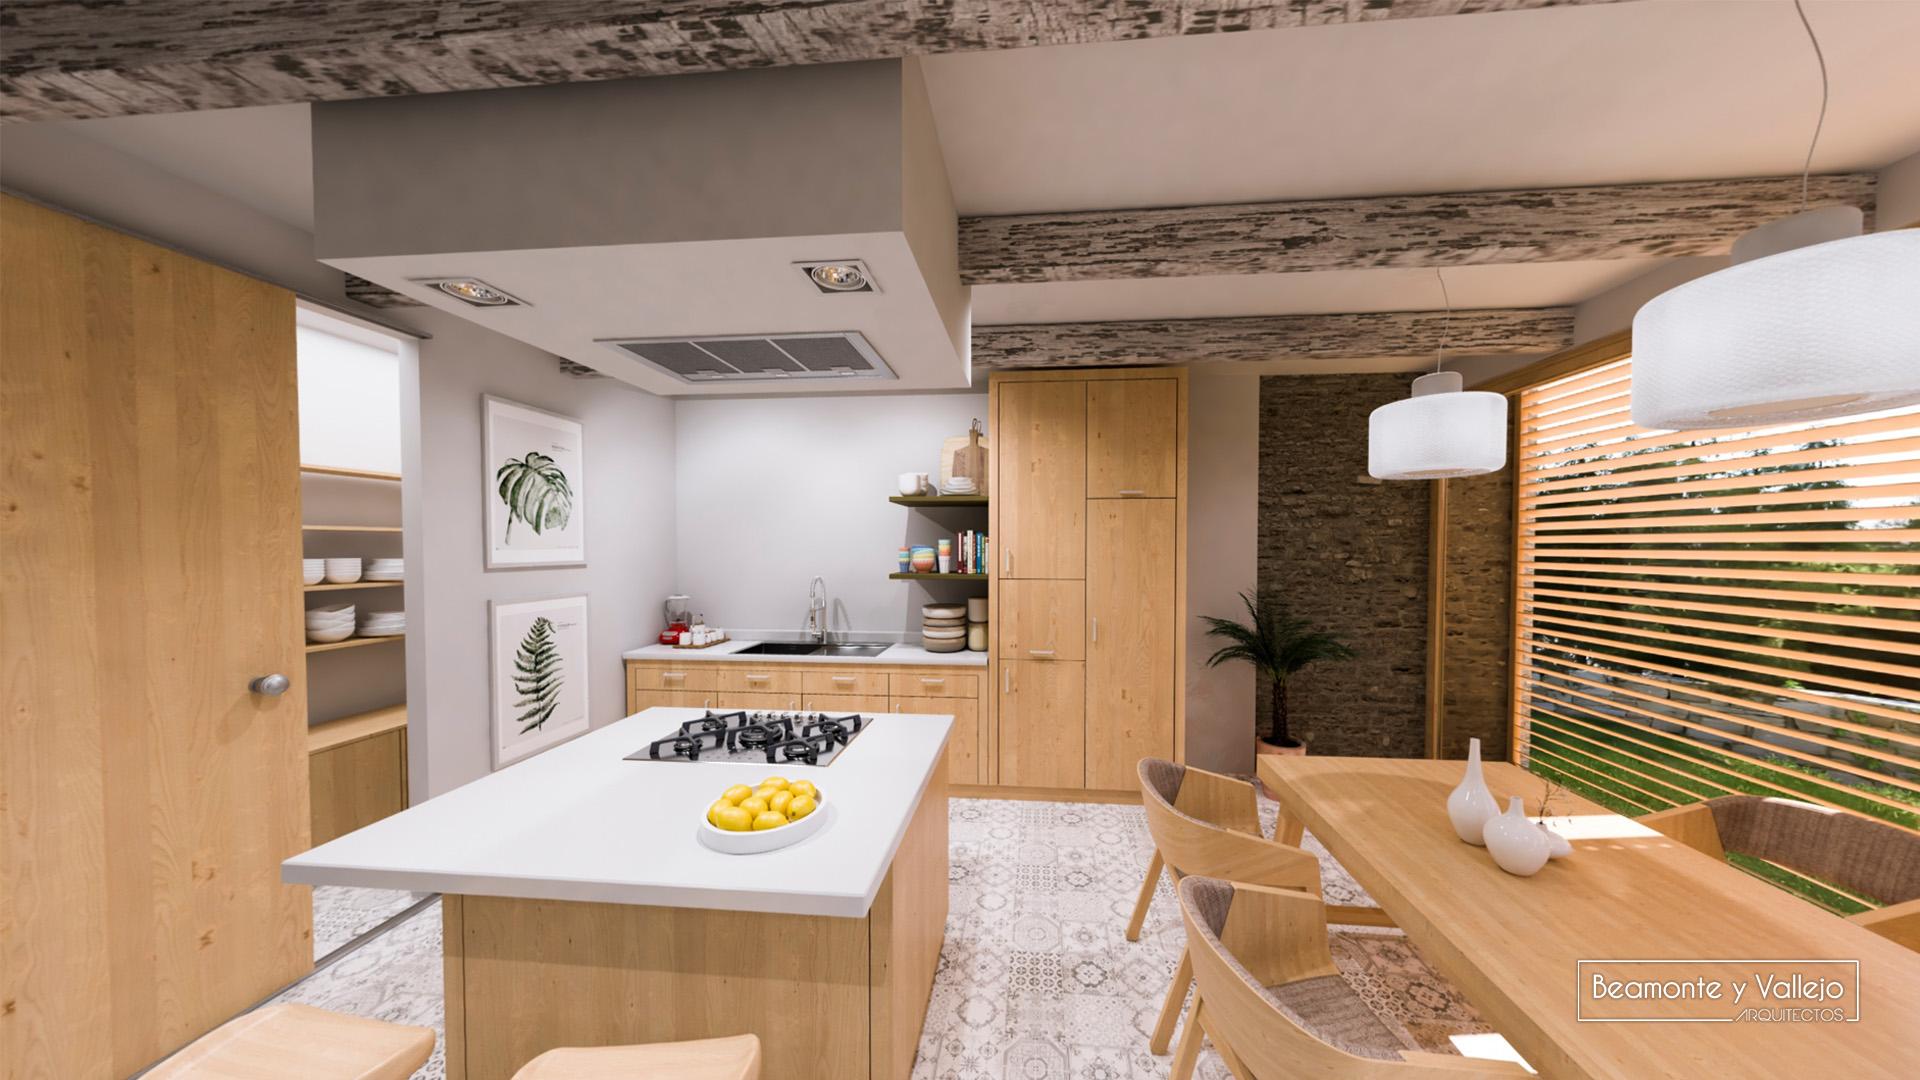 Beamonte y Vallejo arquitectos - Passivhaus Buera - 4